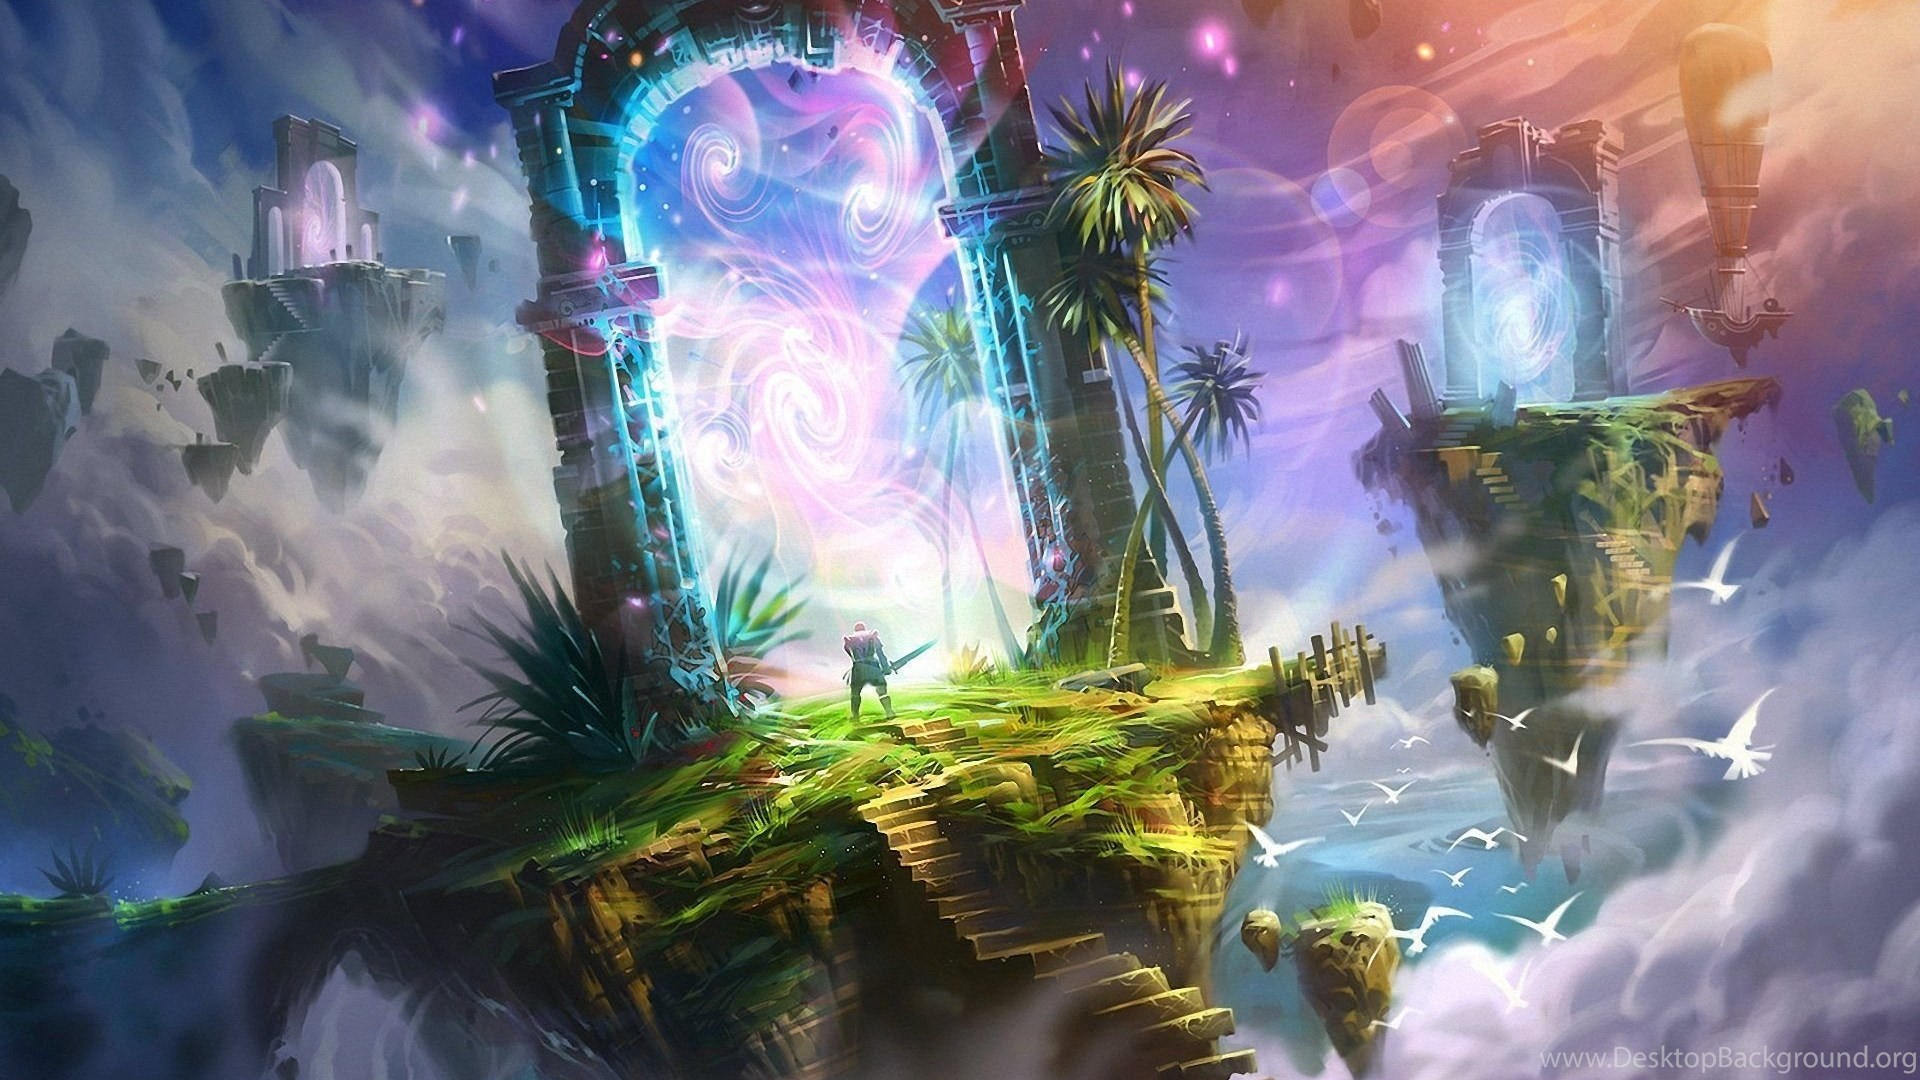 Heaven and hell fantasy wallpapers hd download desktop - Fantasy wallpaper hd ...